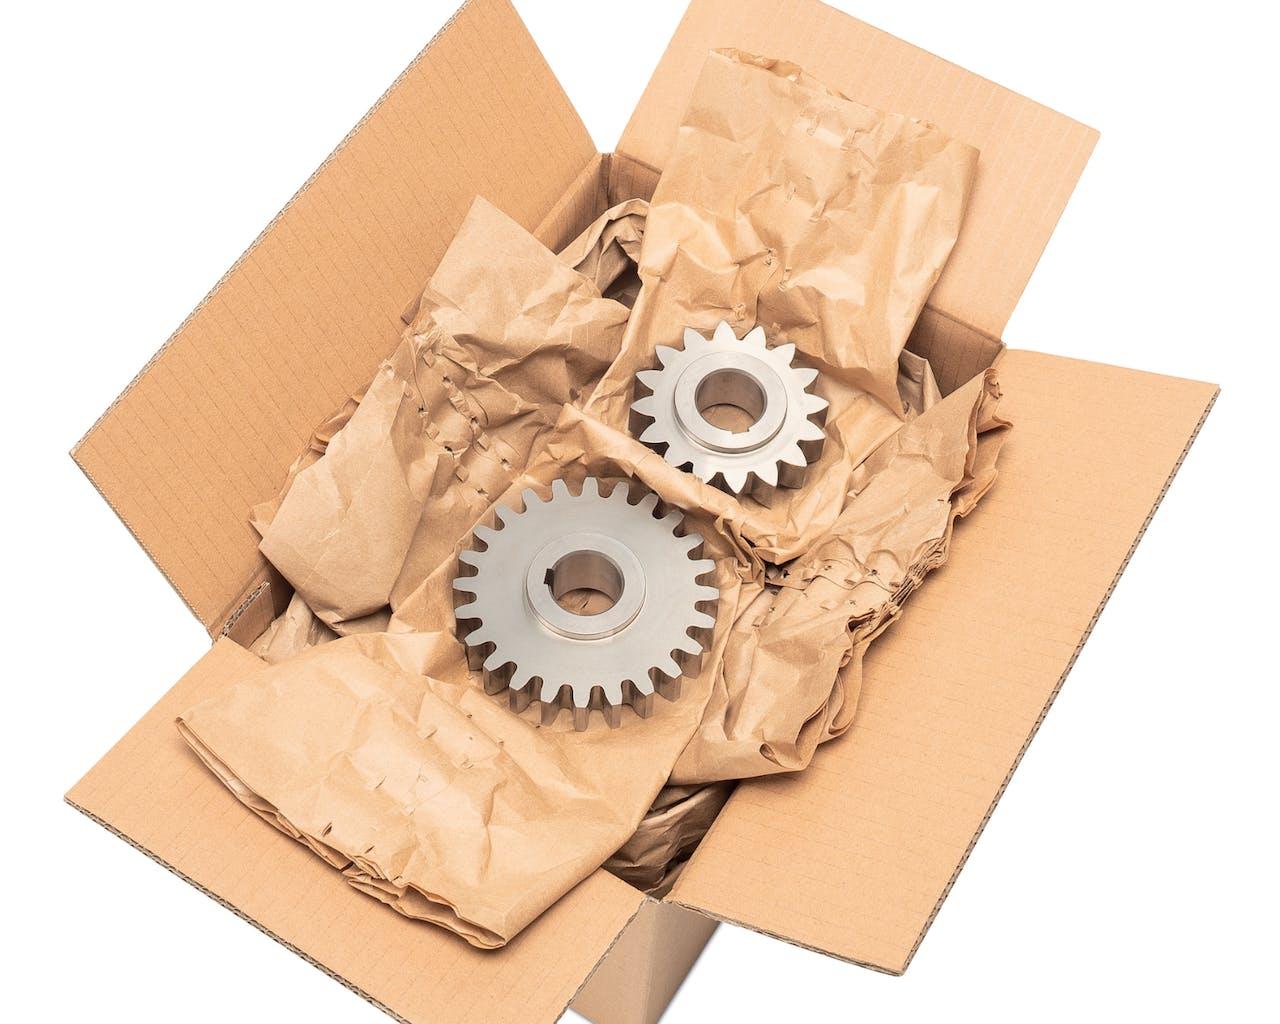 Polstermaterial Papier in Karton